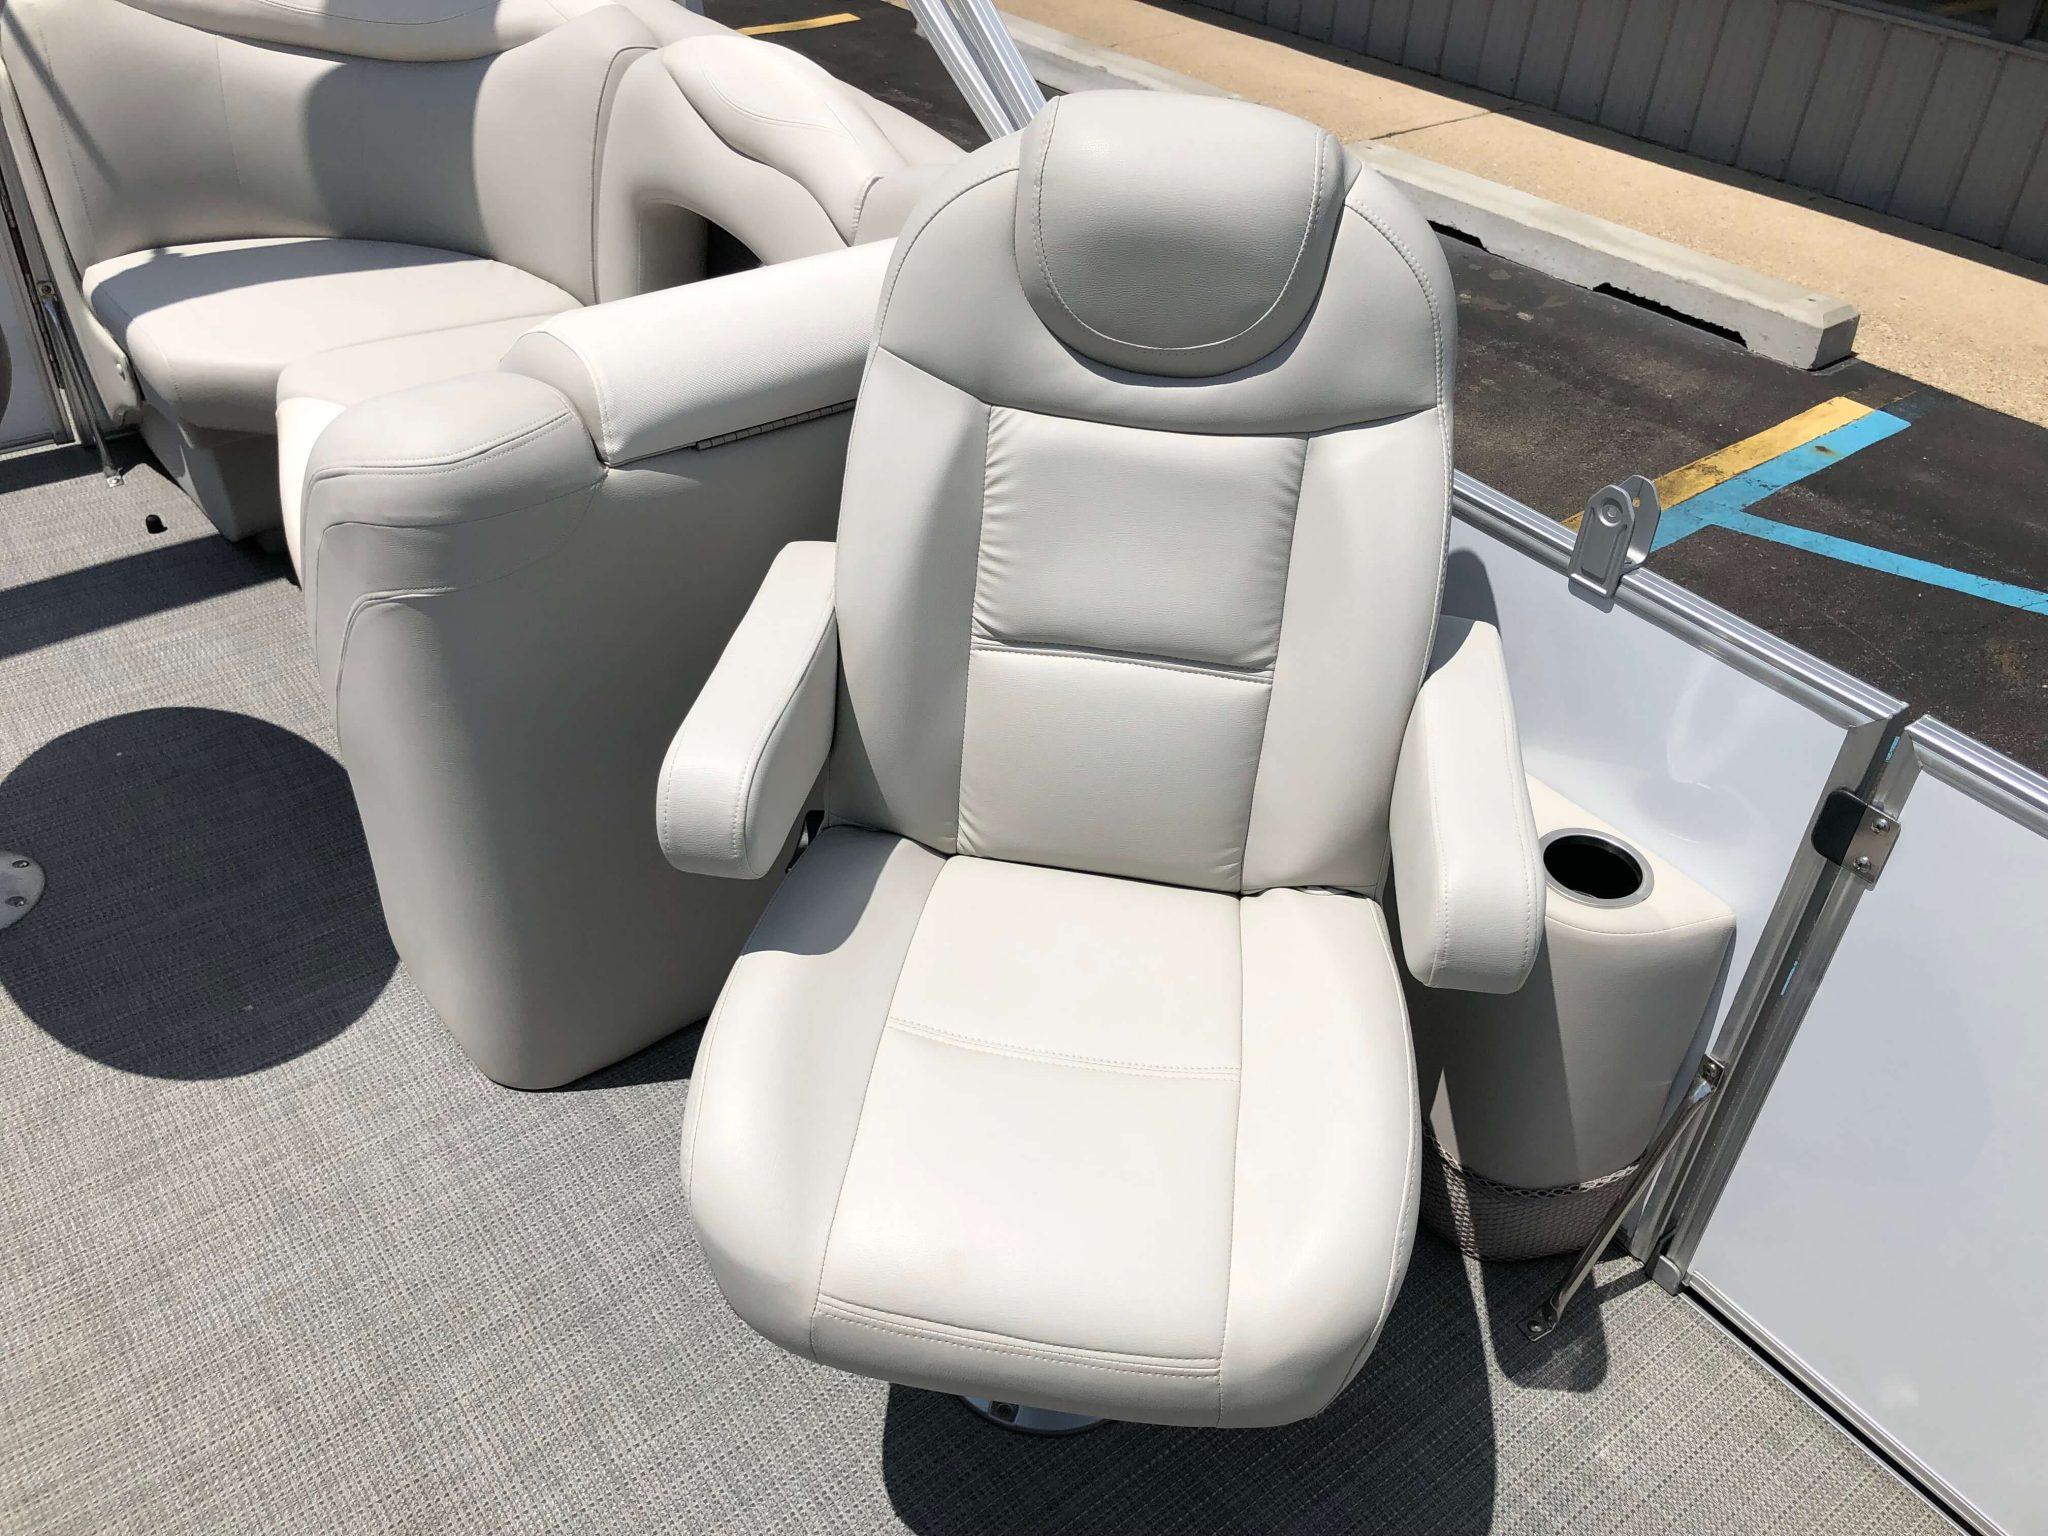 2016 Sylvan 8520 LZ LES Pontoon Boat Passanger Chair